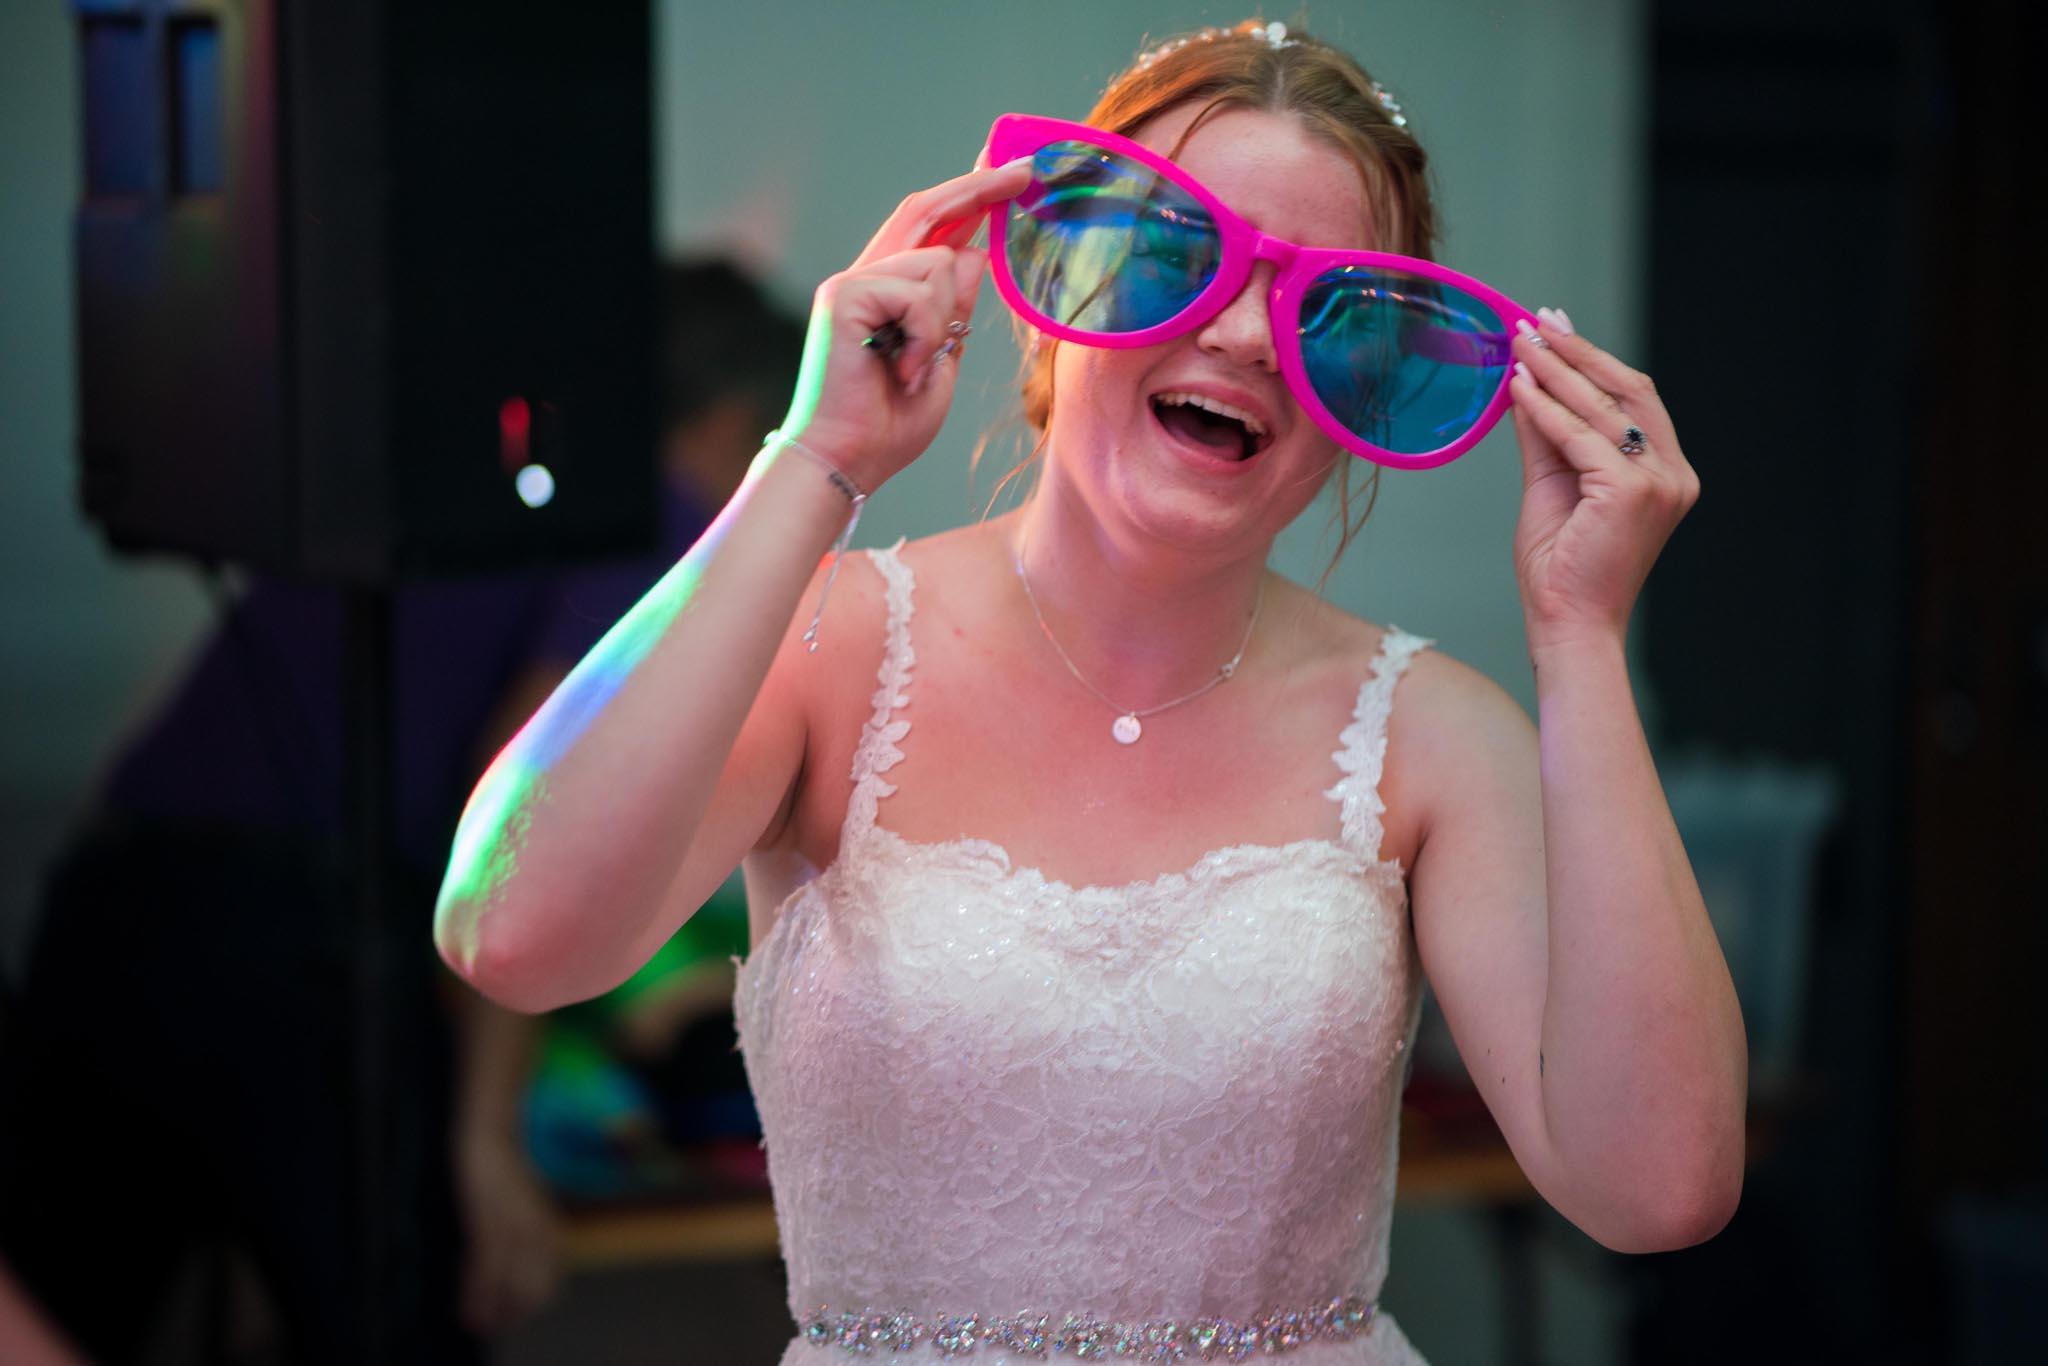 1031-Night-Reception-Luke-Yasmin-The-Rayleigh-Club-Wedding-Photography.jpg